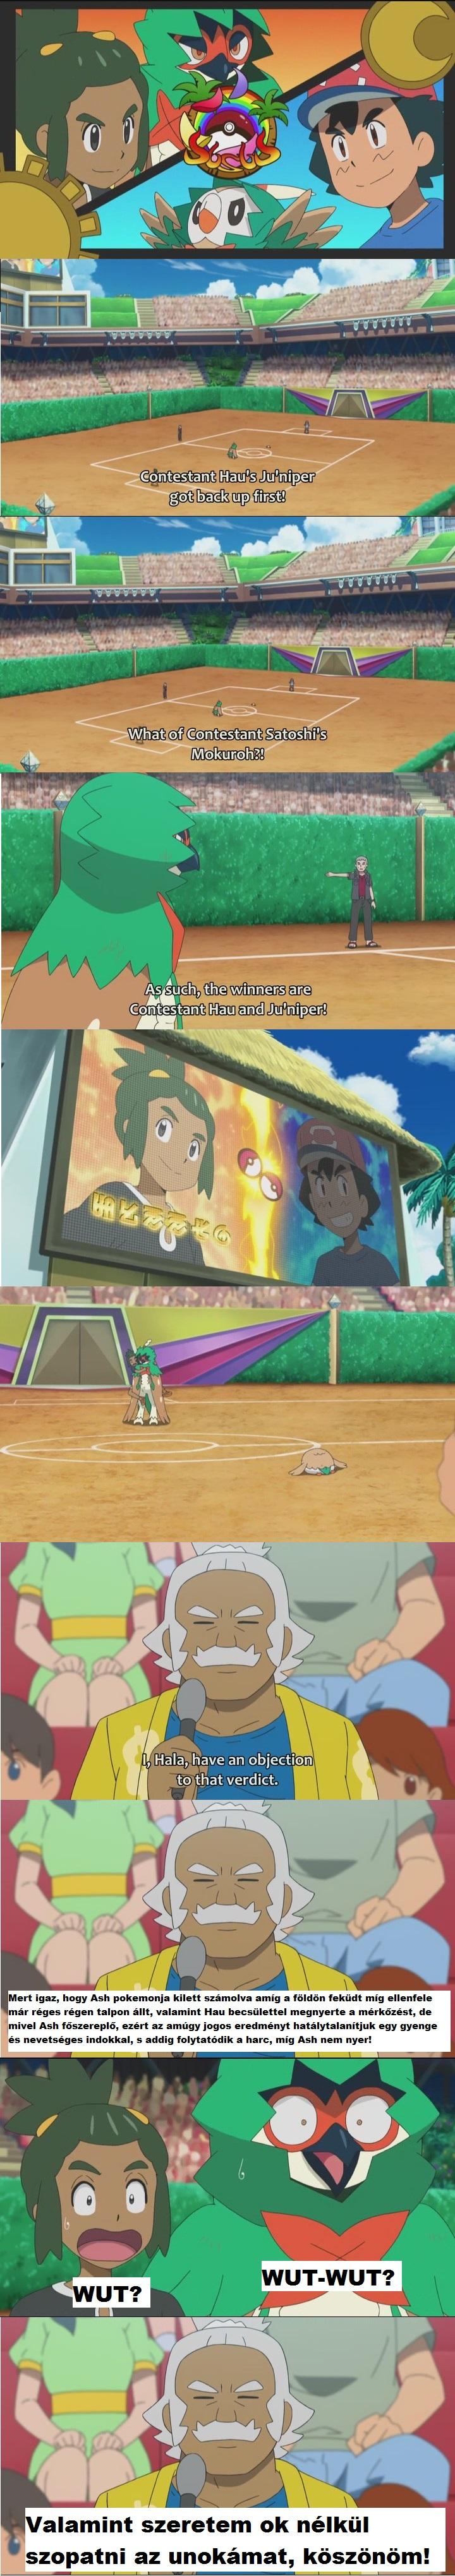 watch_pokemon_sun_moon_episode_132_english_subbedat_gogoan_0001.jpg